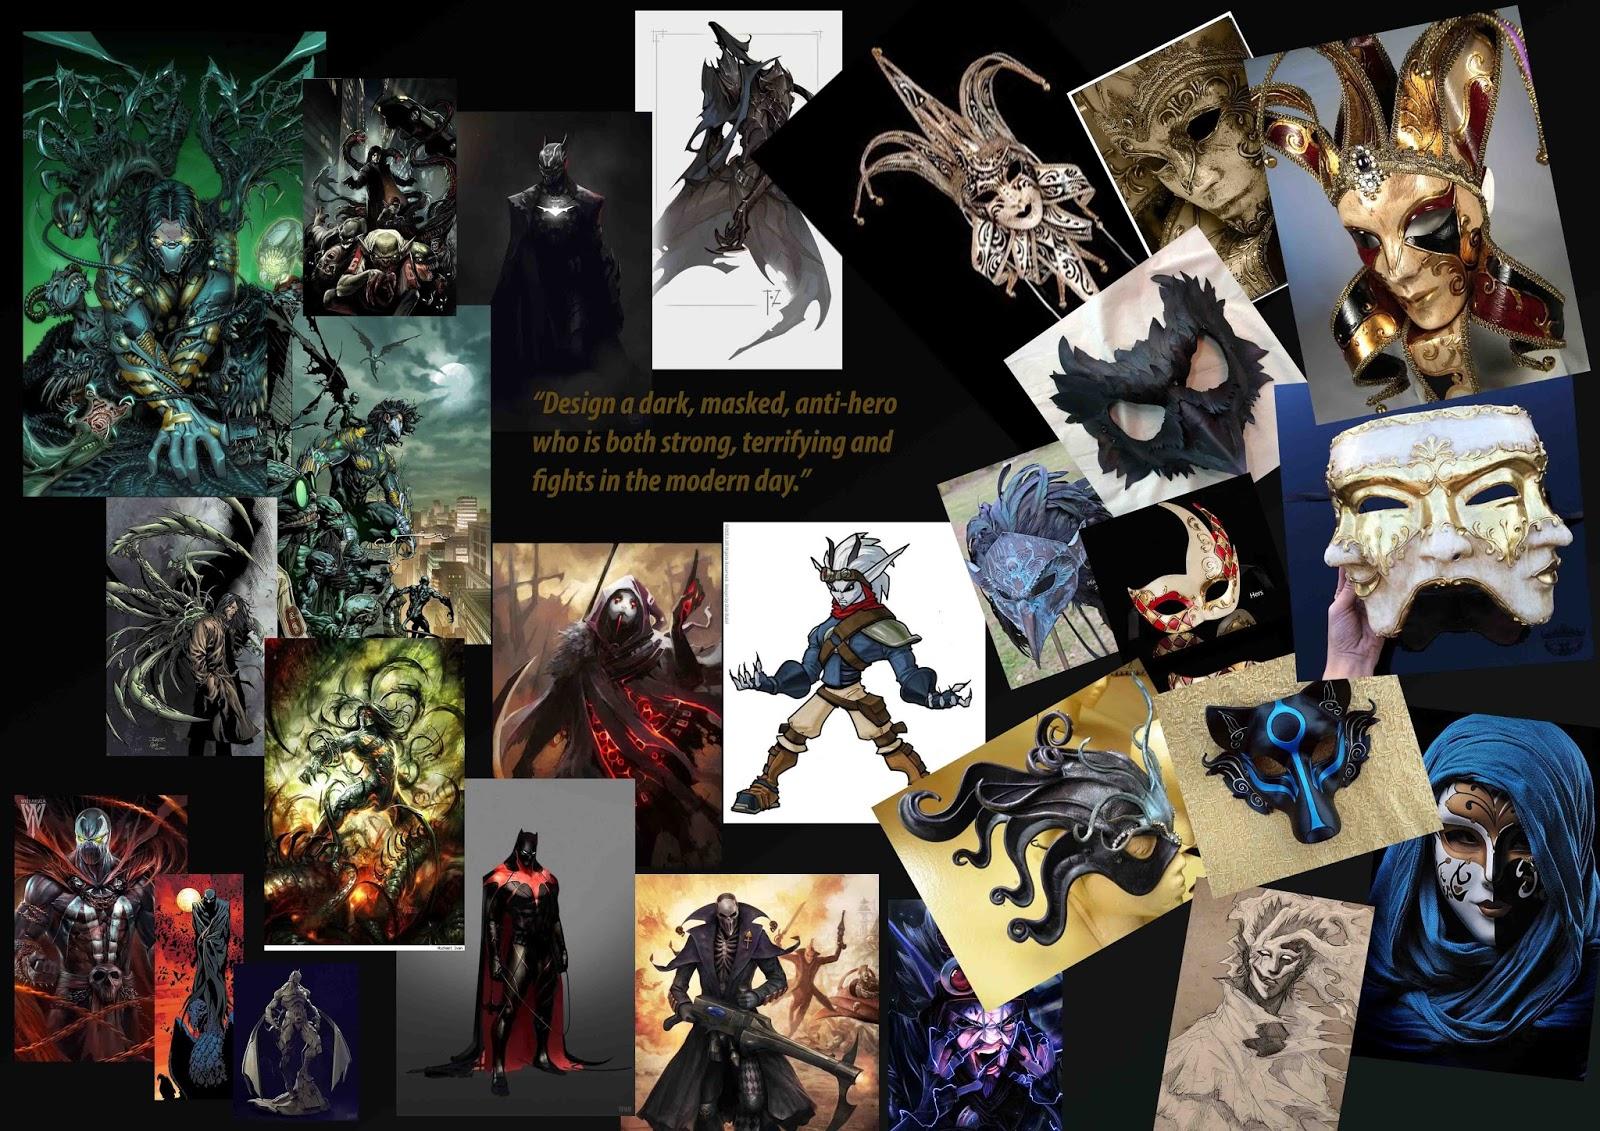 Character Design Mood Board : Adengeorge onceuponananimaton viscom character design